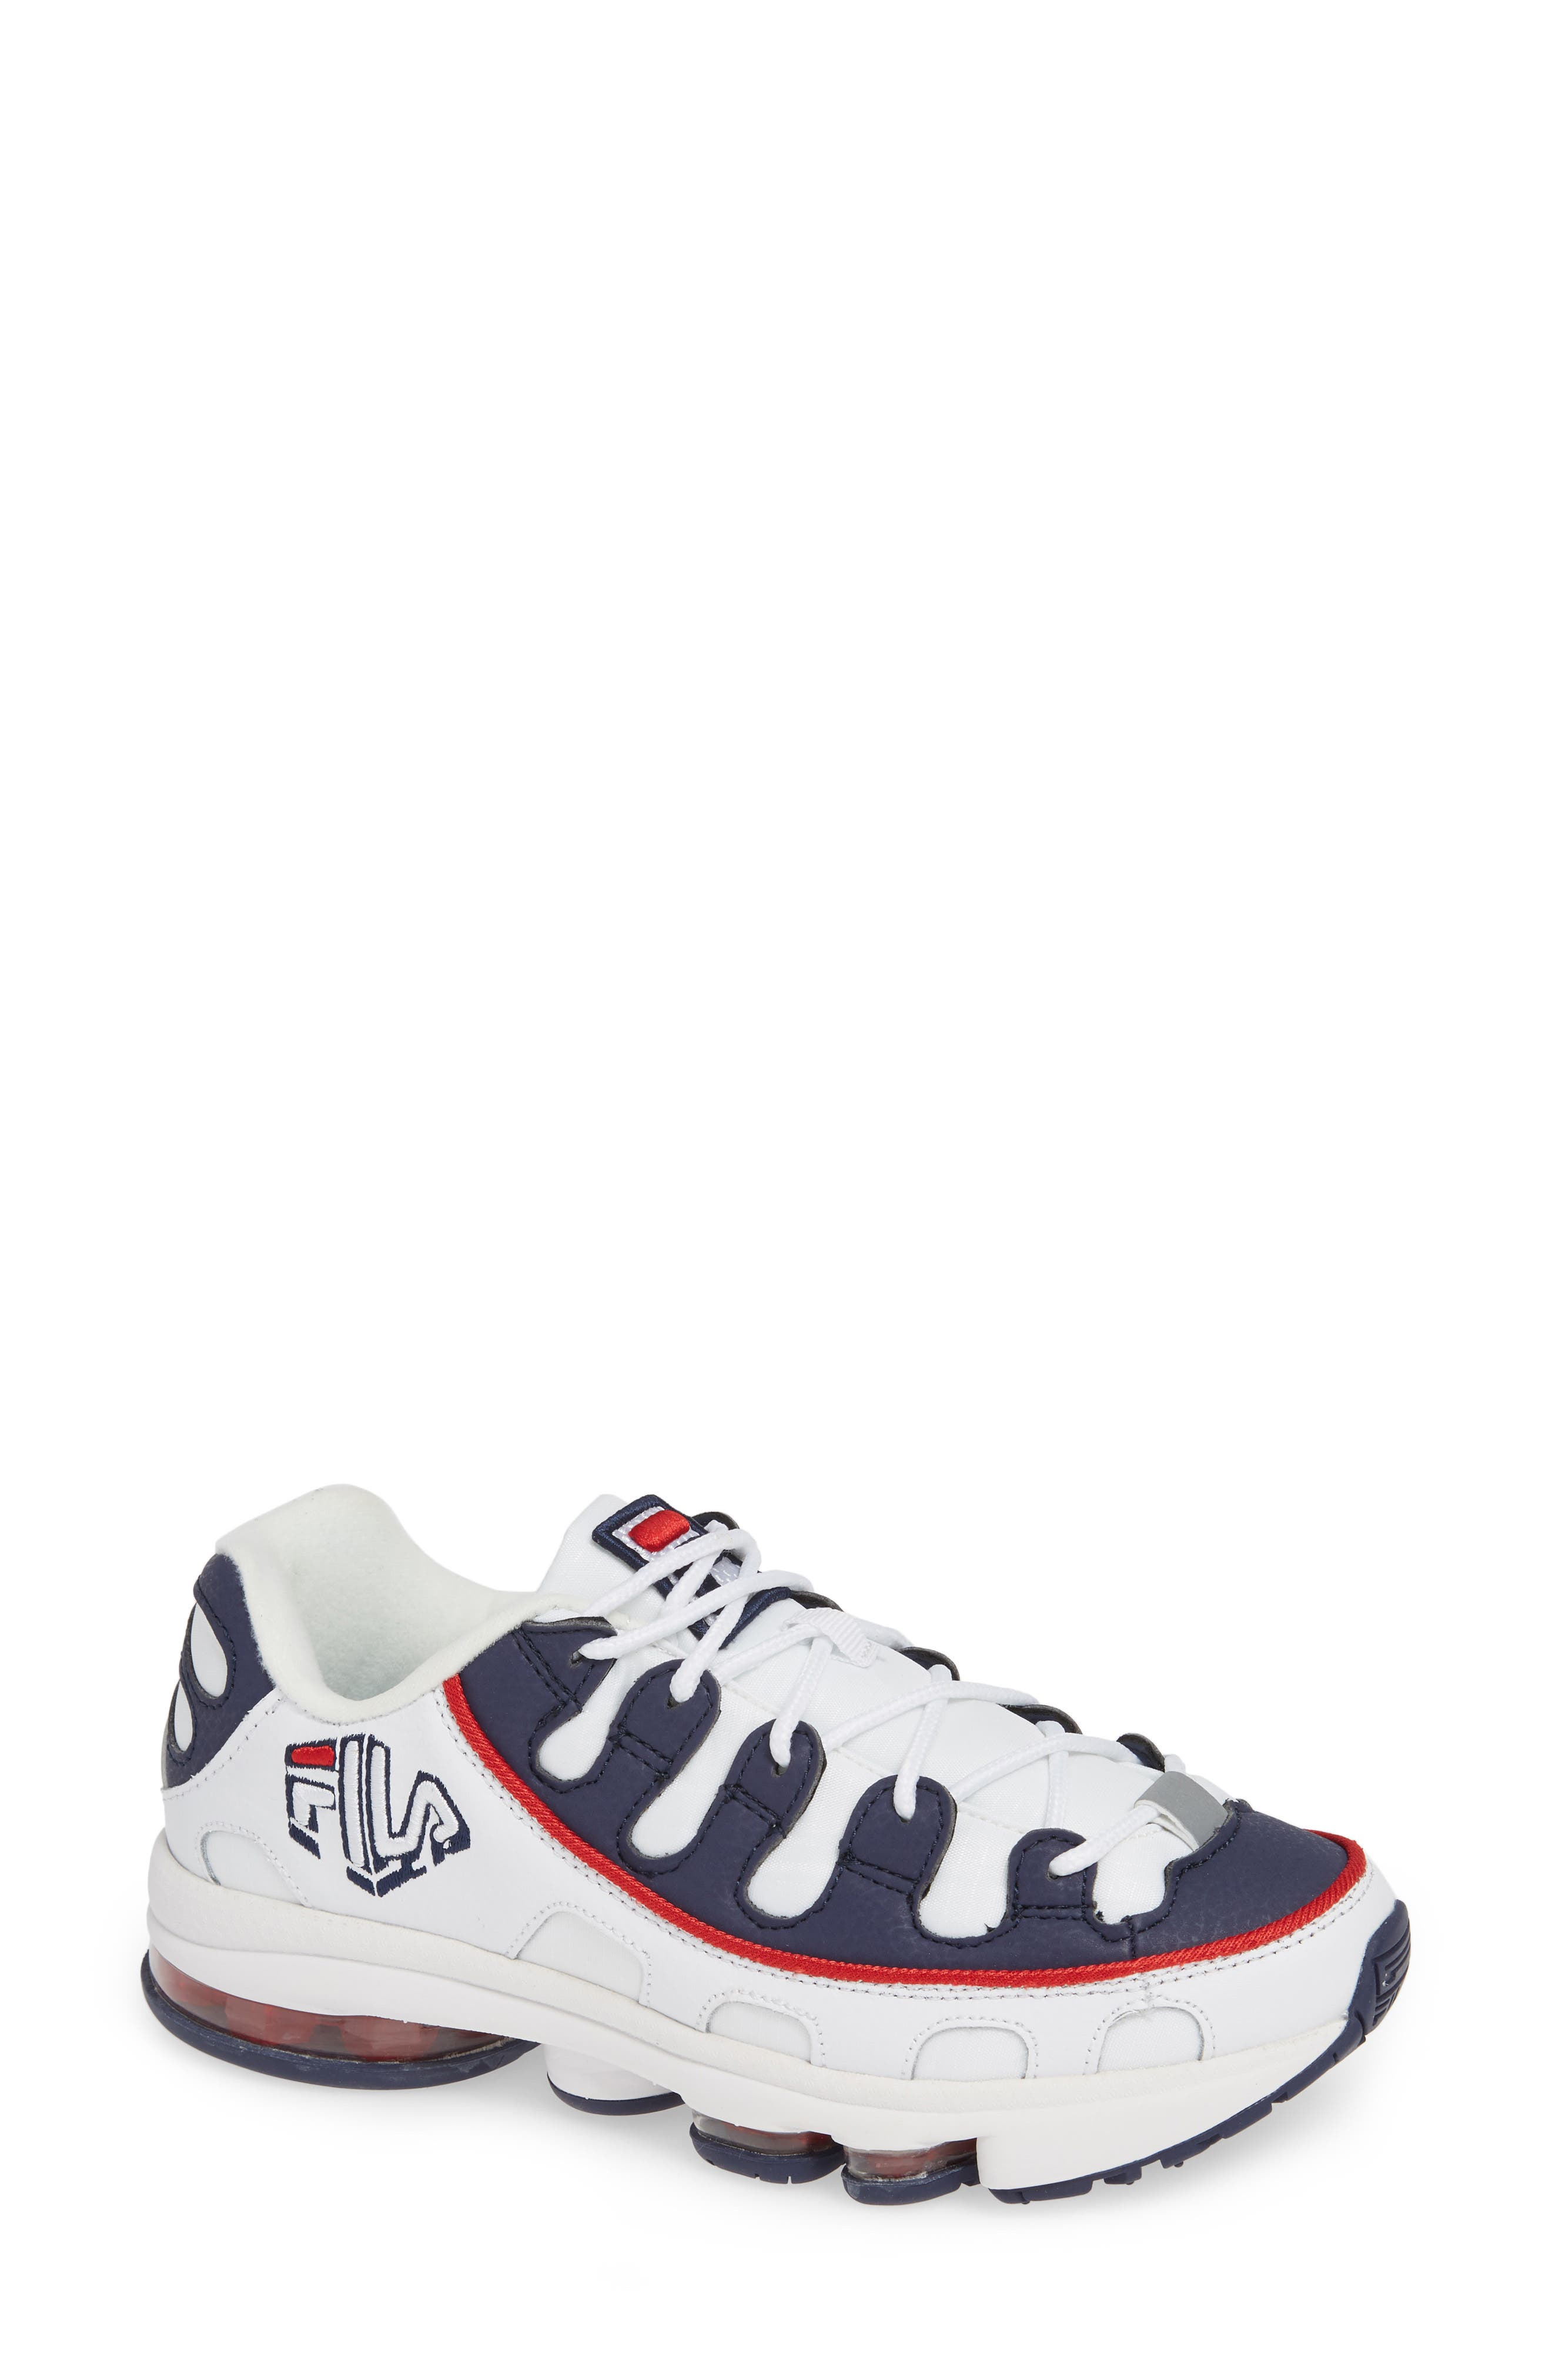 Silva Trainer Sneaker,                             Main thumbnail 1, color,                             WHITE/ NAVY/ RED